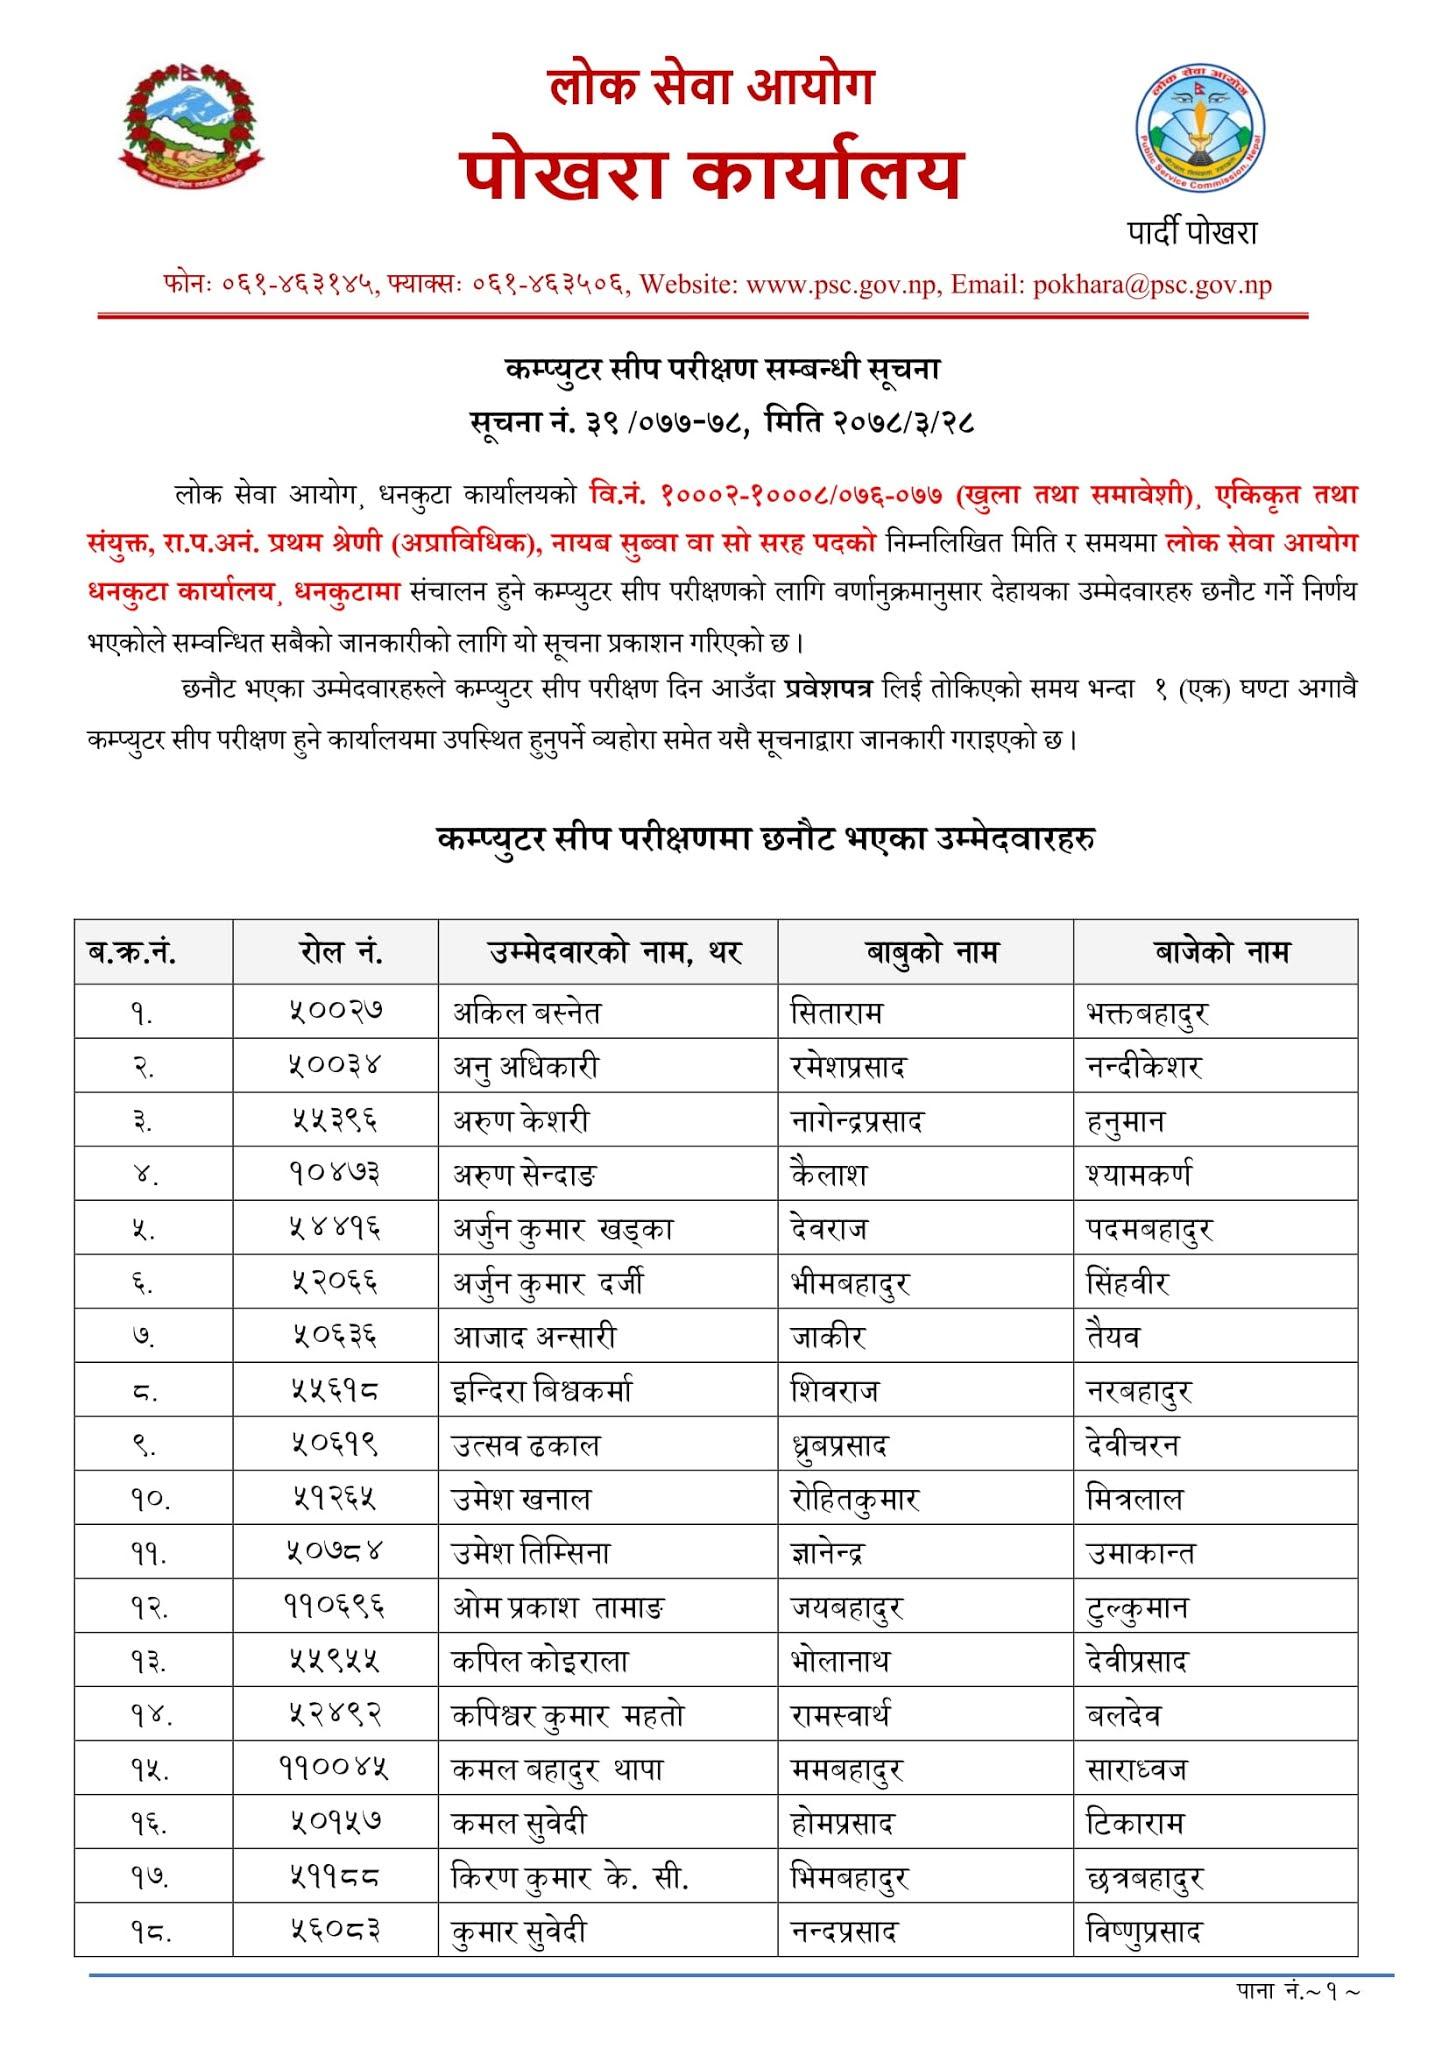 NASU - Dhankuta Lok Sewa Aayog Written Exam Result & Exam Schedule